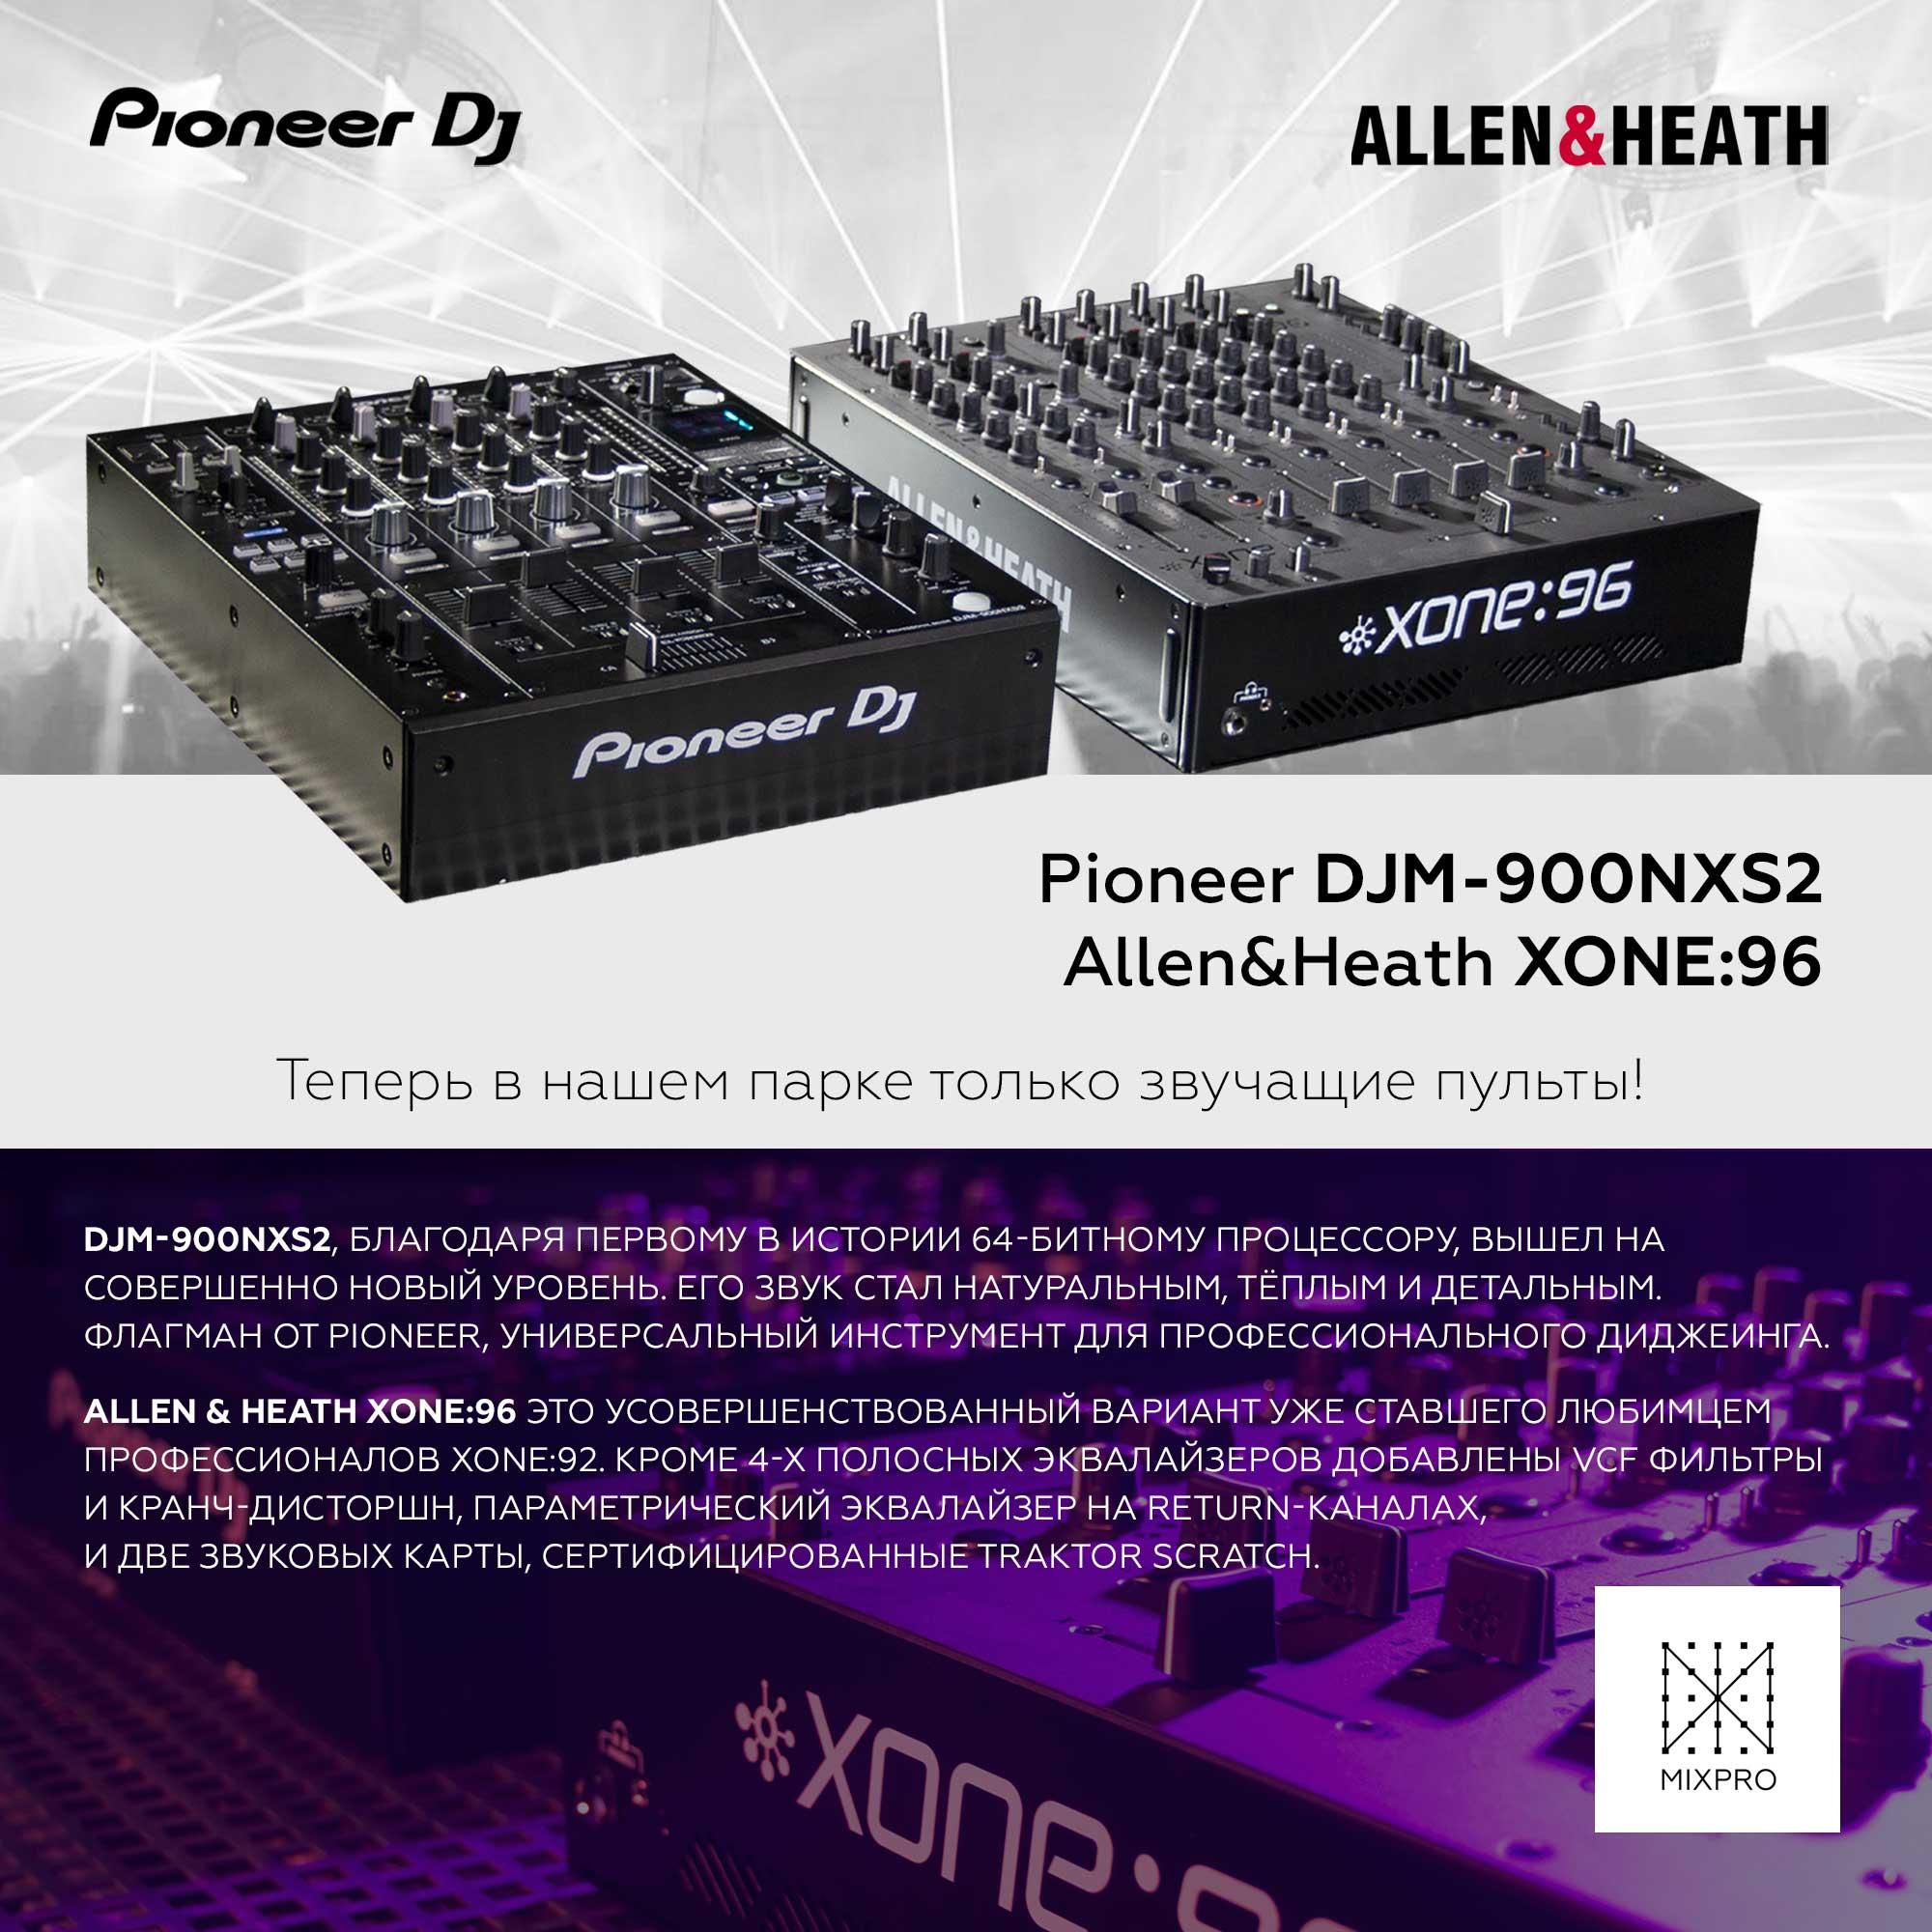 Новые пульты — Pioneer DJM-900NXS2 и Allen&Heath XONE:96